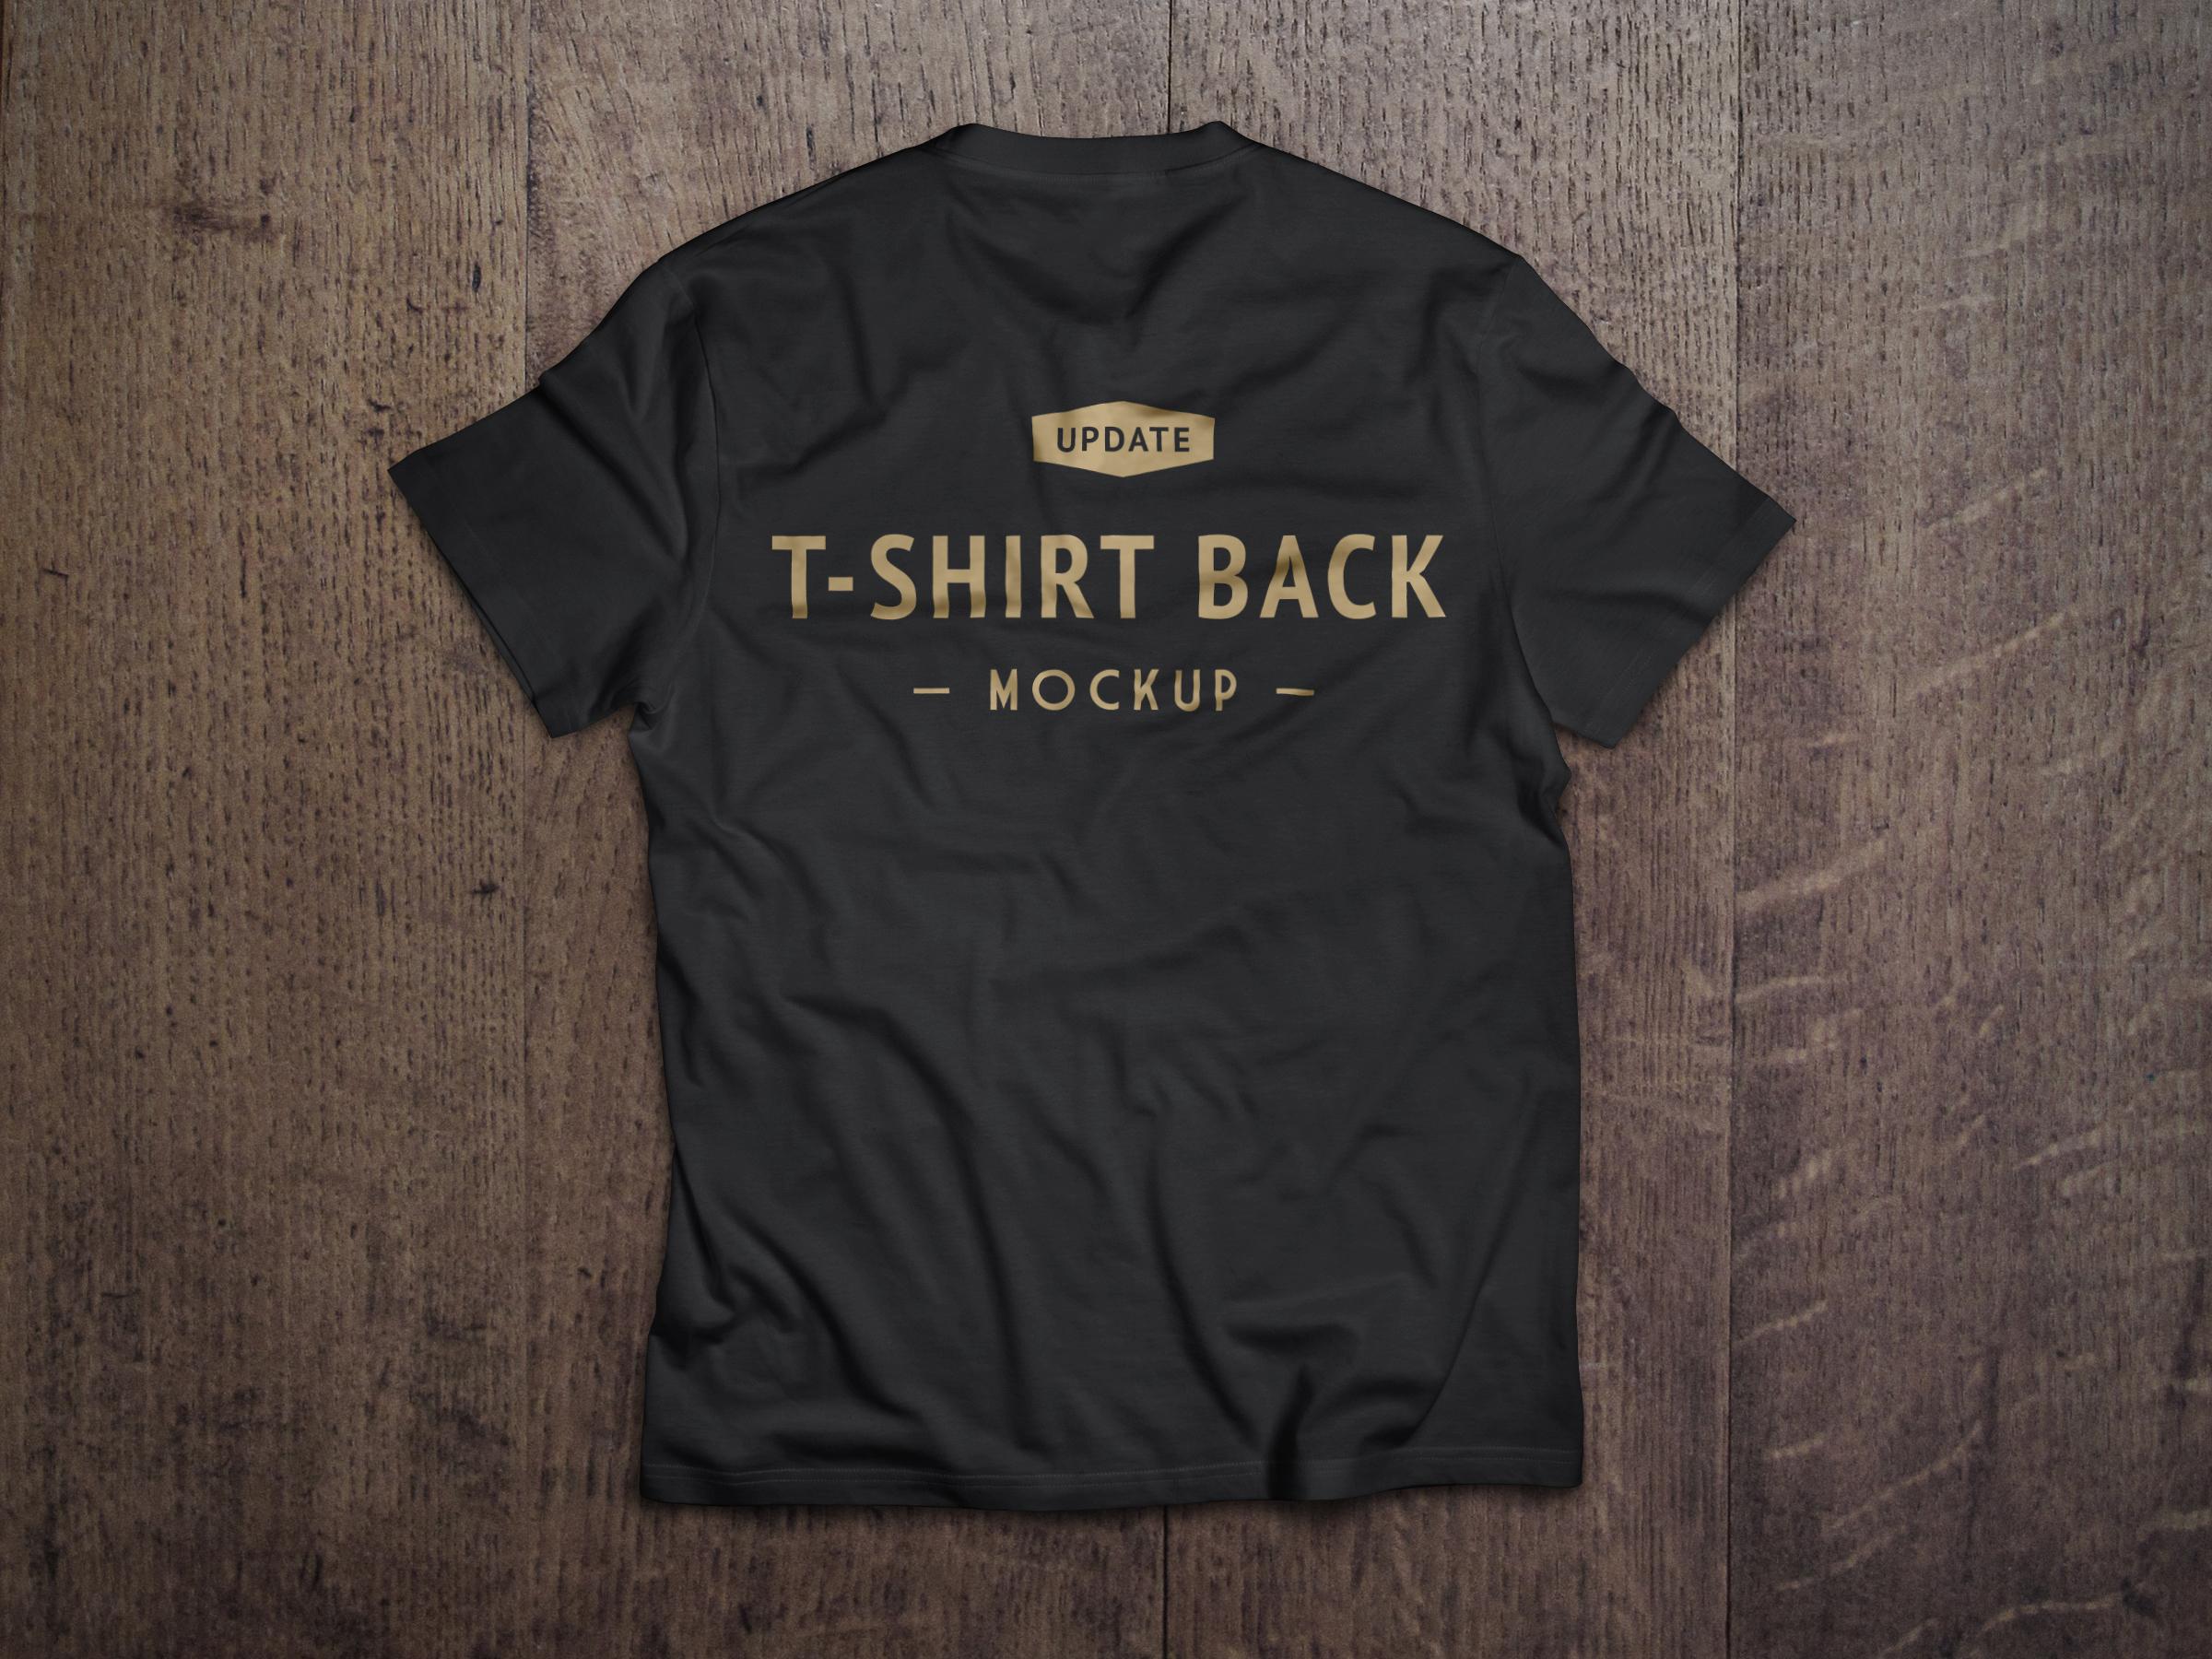 t shirt mockup psd pafpic